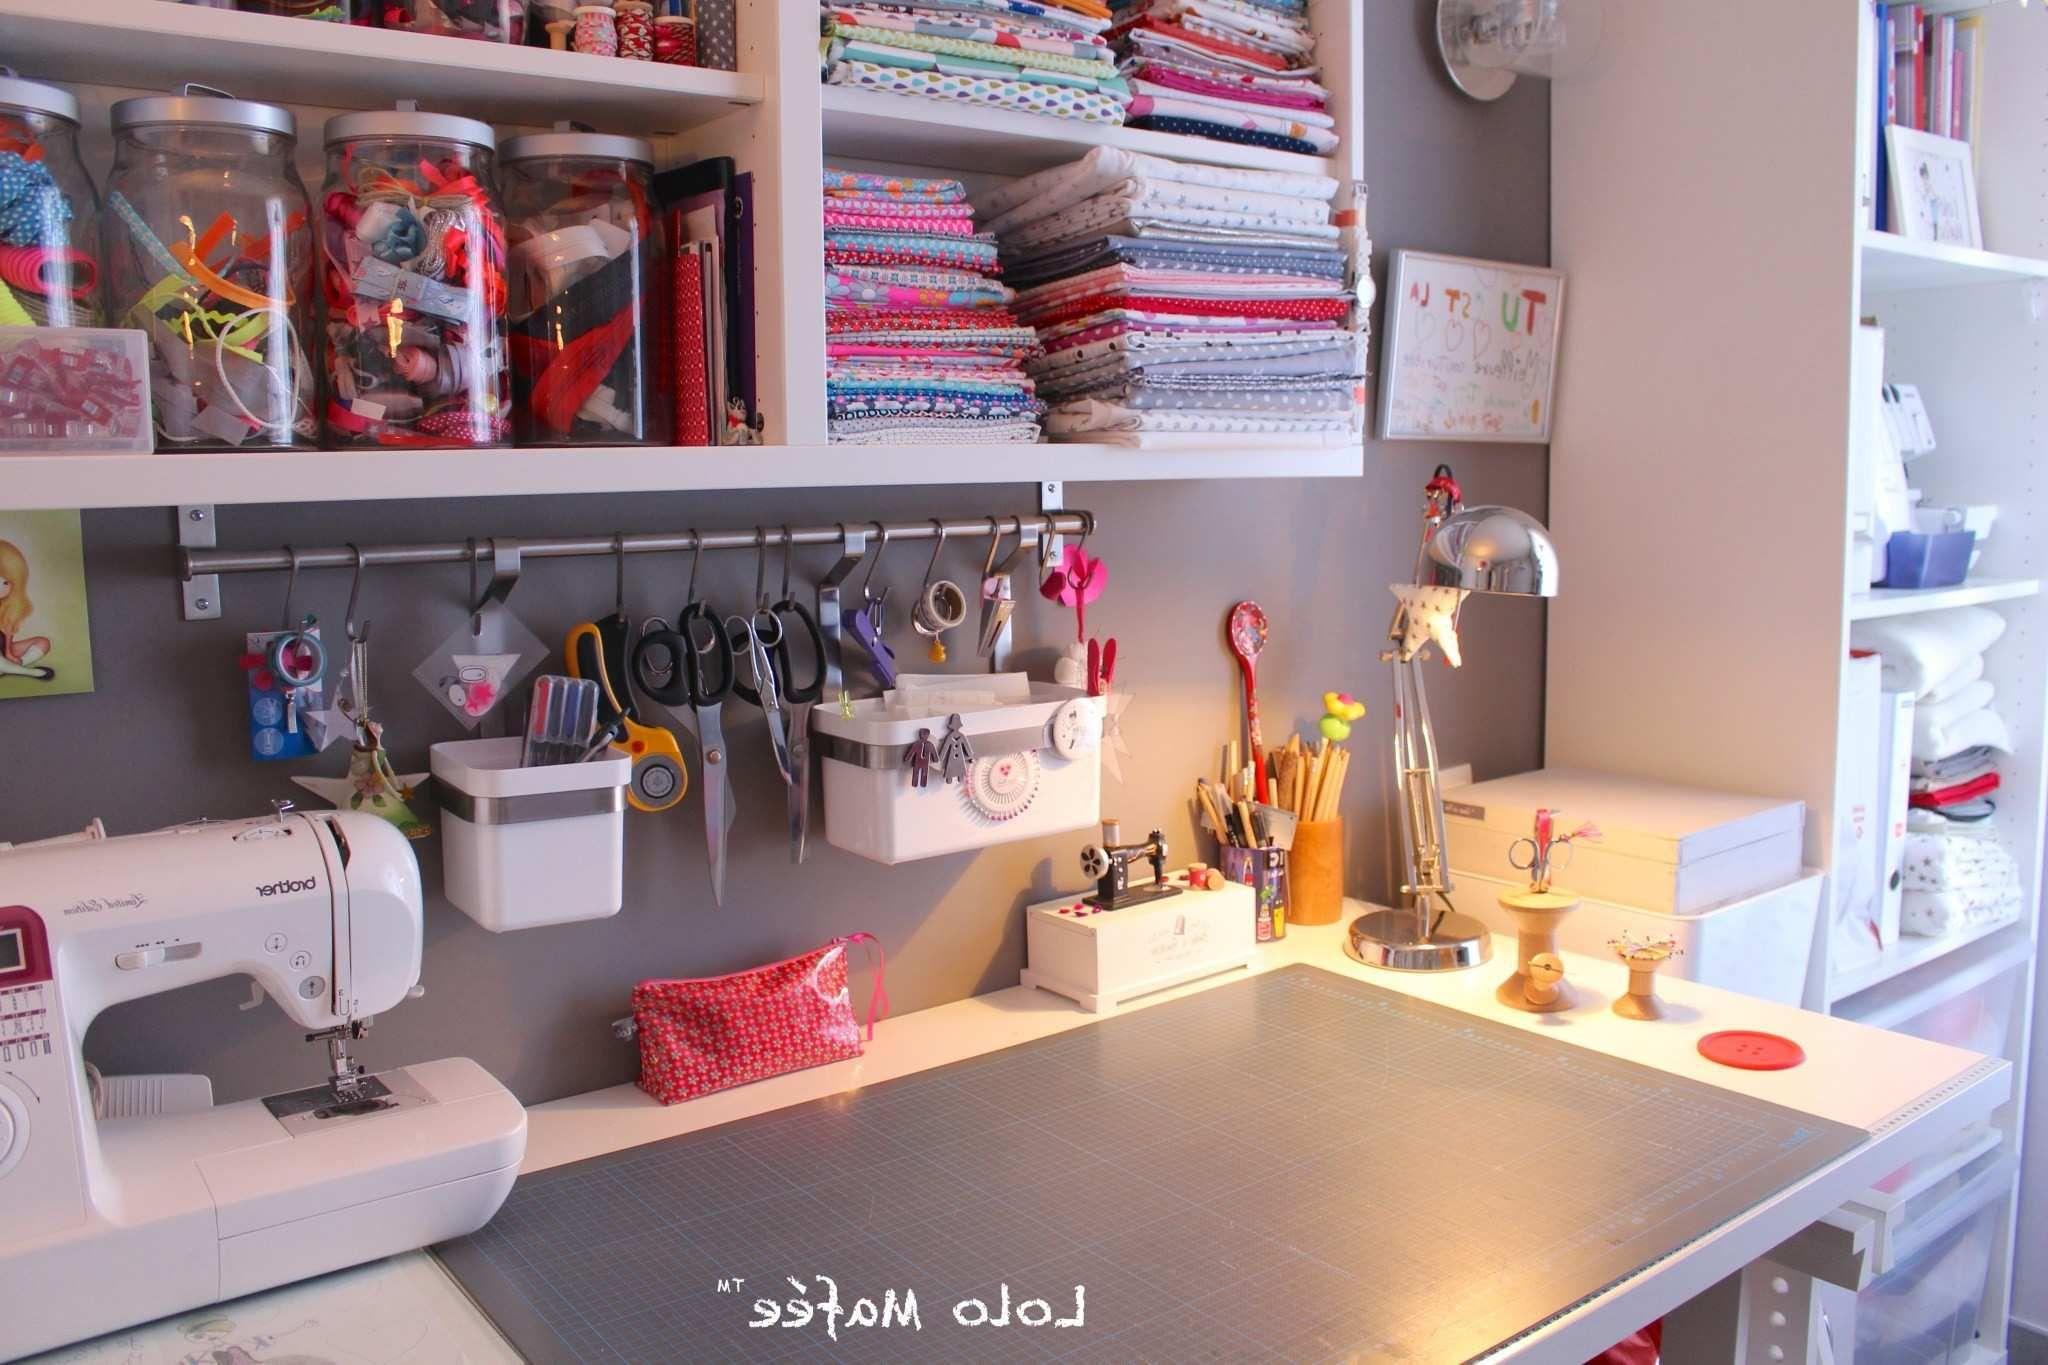 Rangement Atelier Couture Ikea Unique Deco 12 Idees Pour Amenager Son Atelier Couture Dans Un Petit Sewing Room Organization My Sewing Room Pegboard Storage